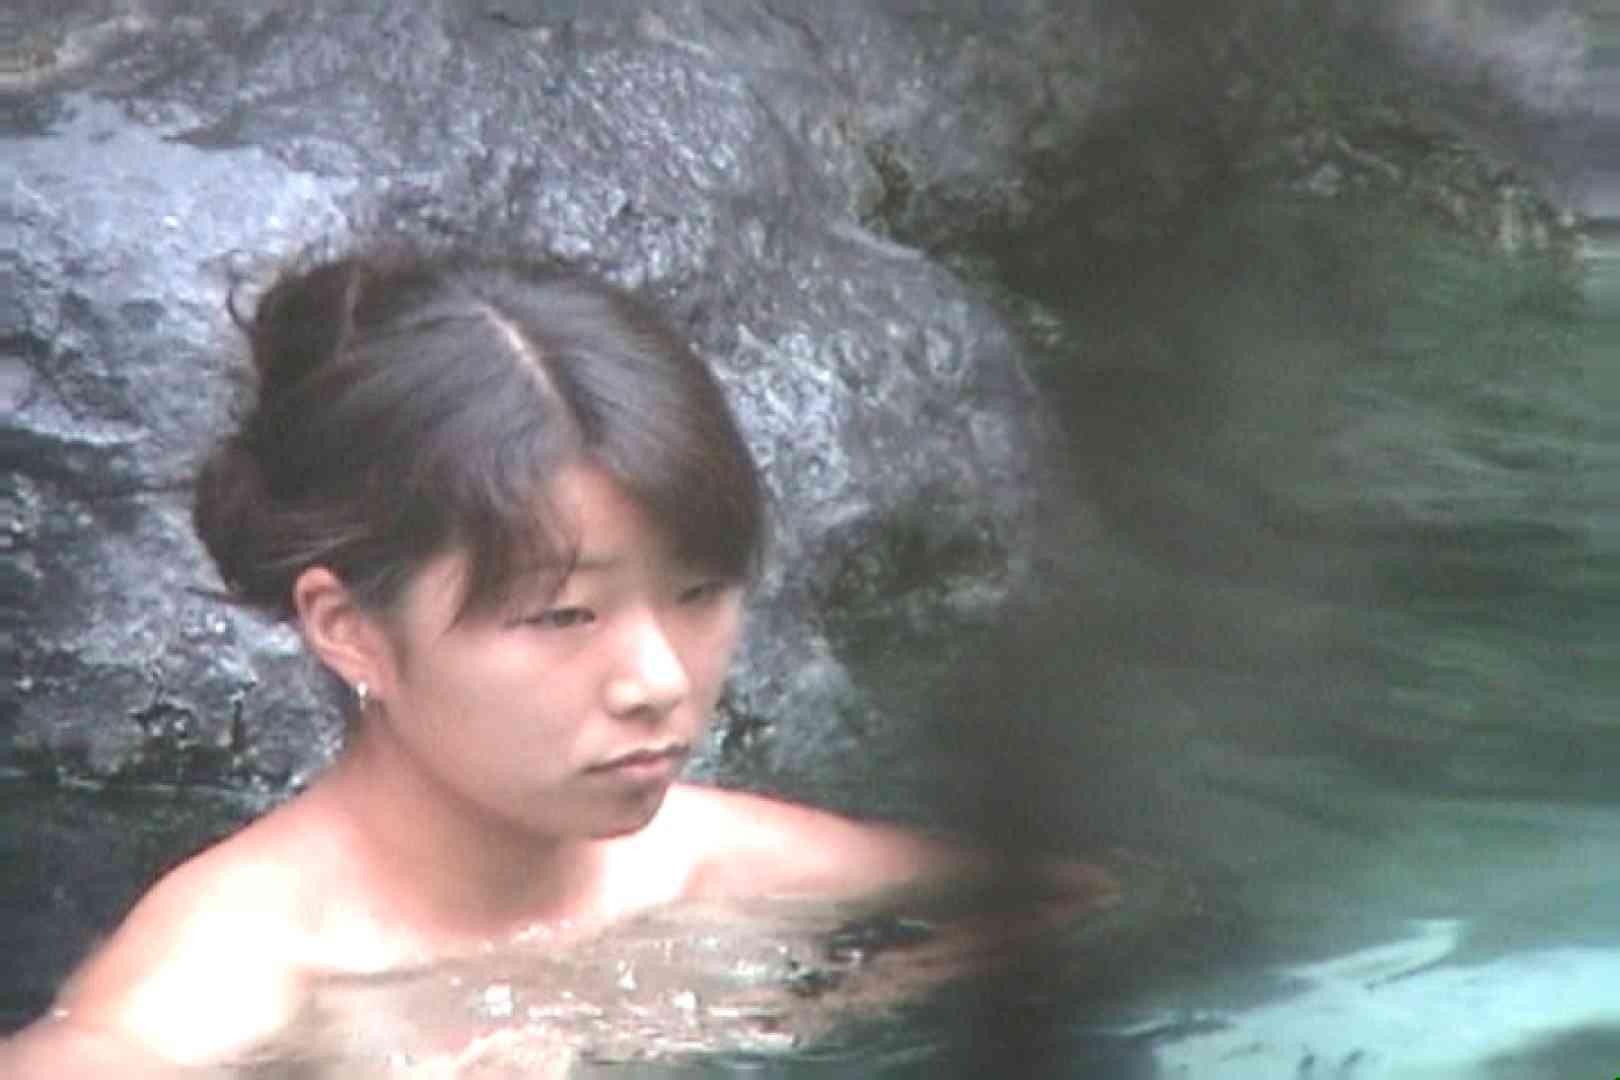 Aquaな露天風呂Vol.69【VIP限定】 盗撮 アダルト動画キャプチャ 106連発 56